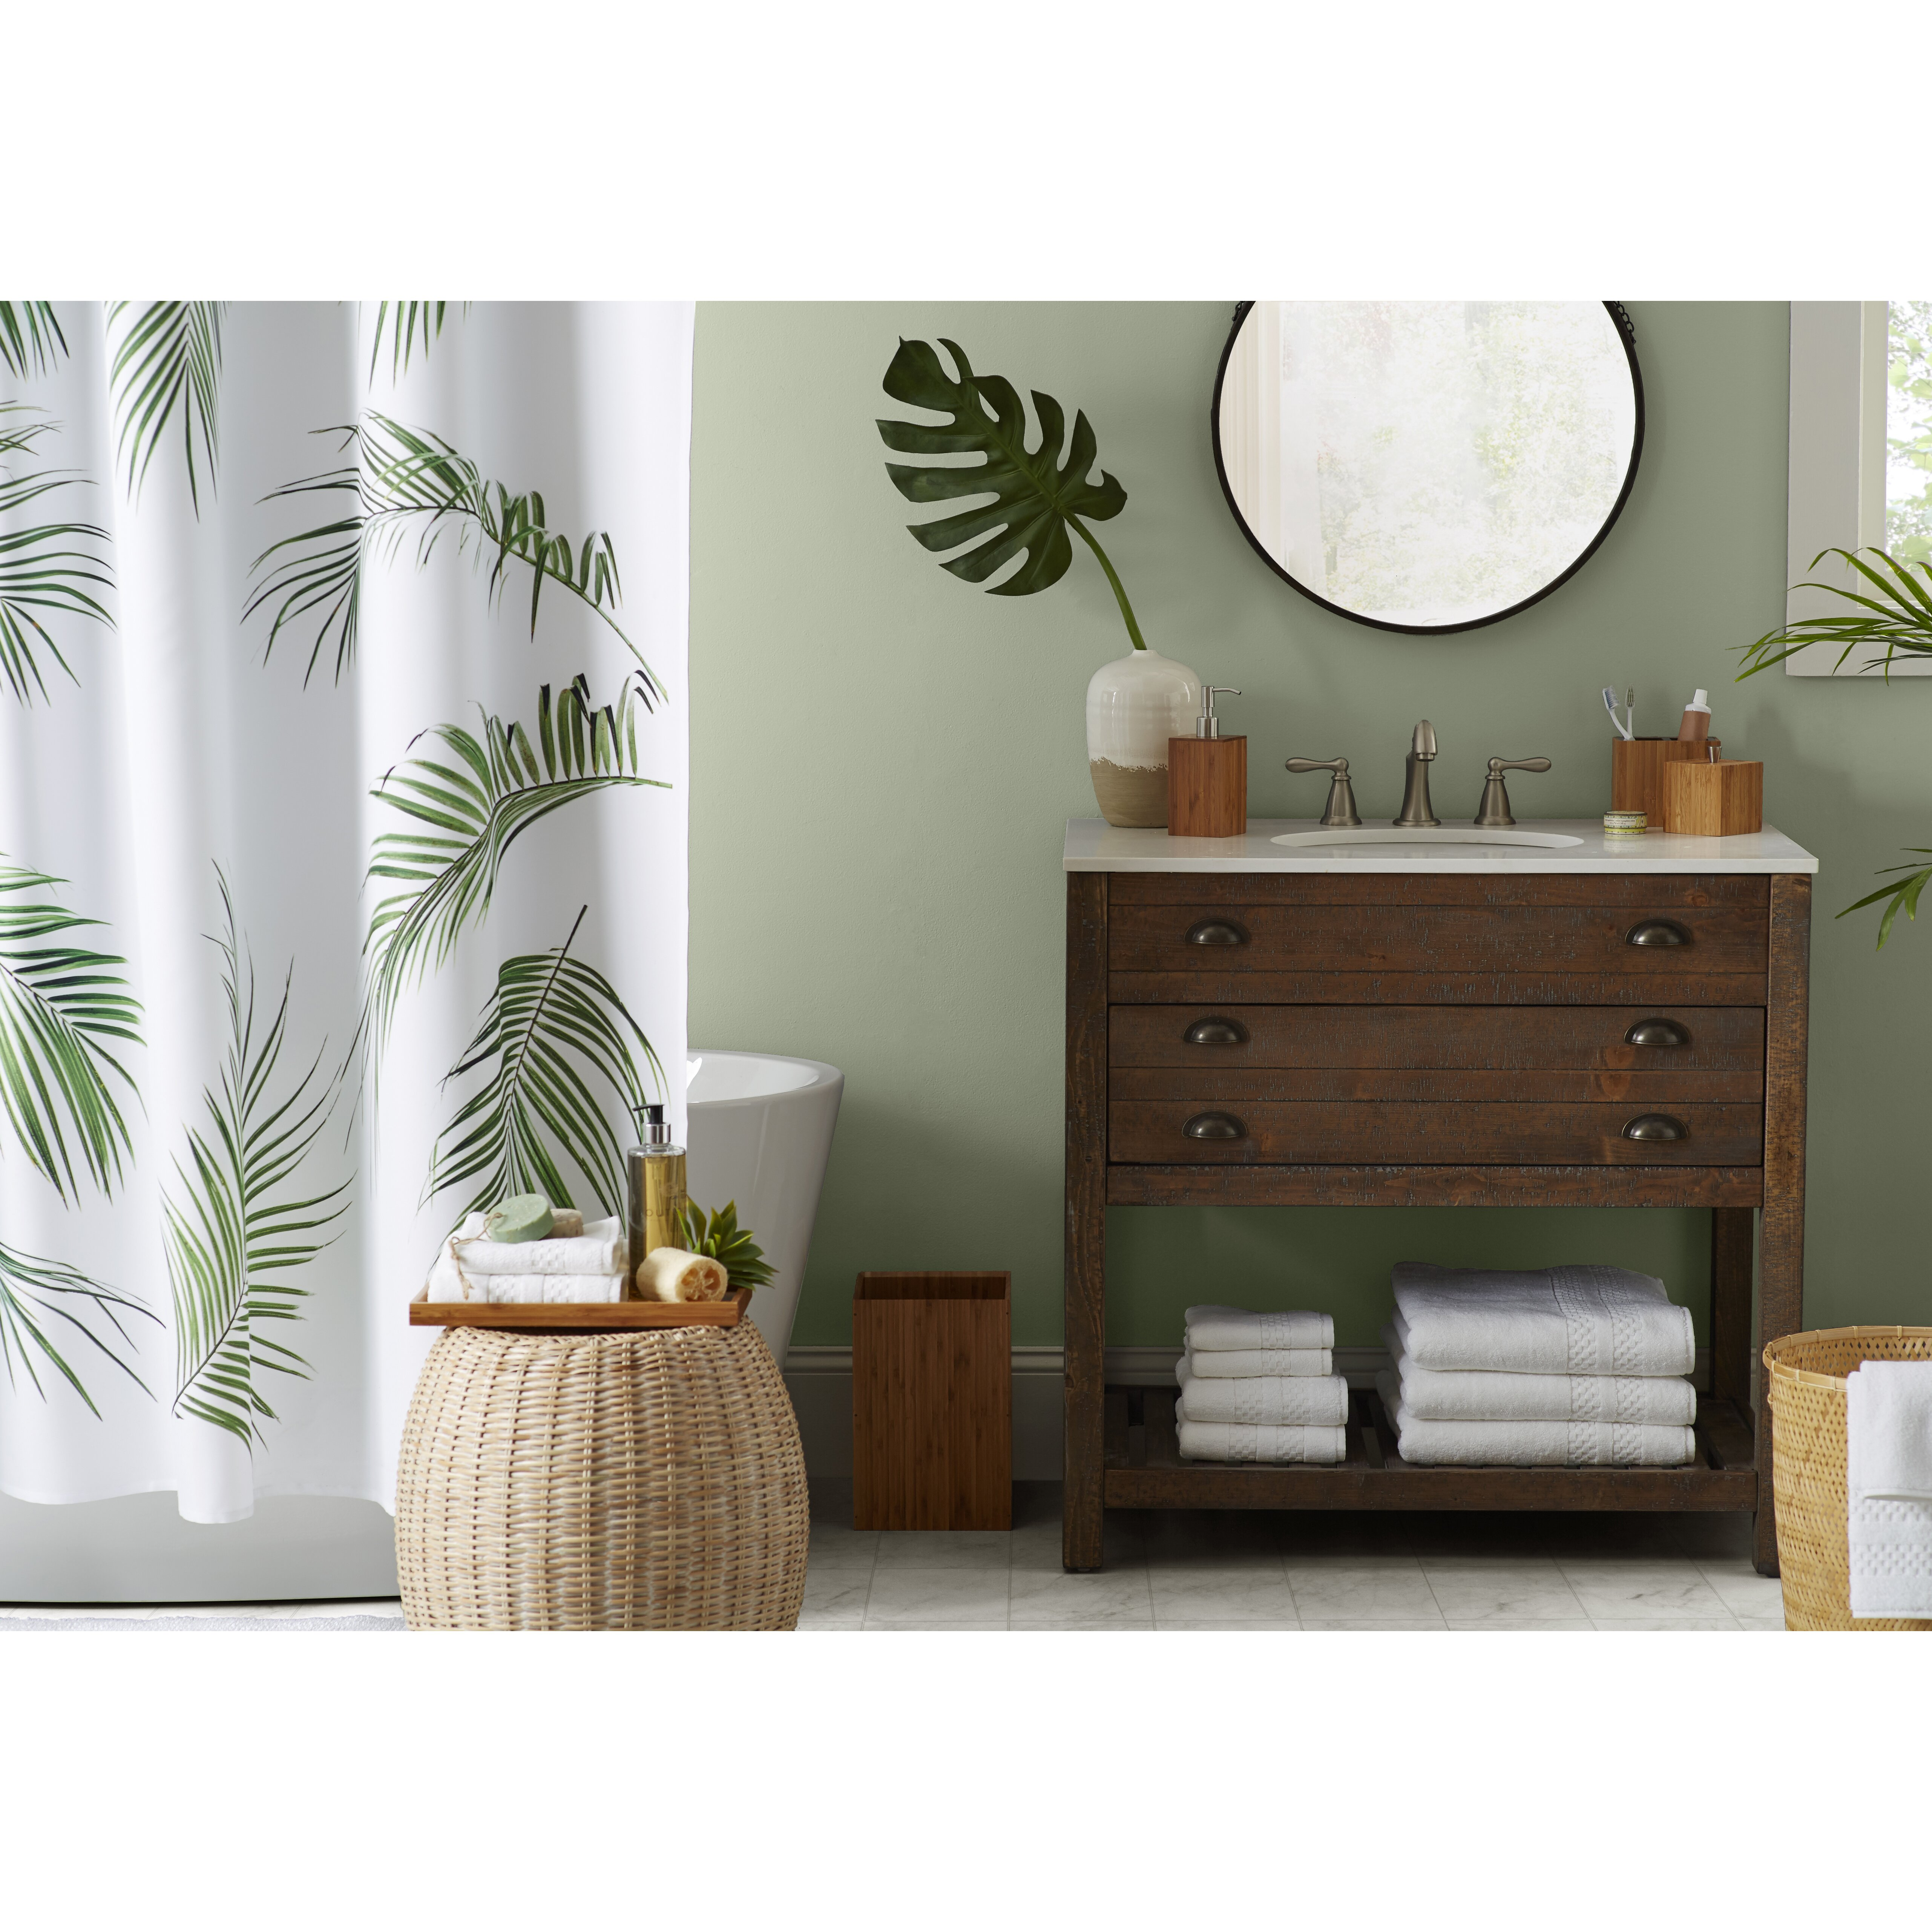 Bamboo Bathroom Accessories Dact Us